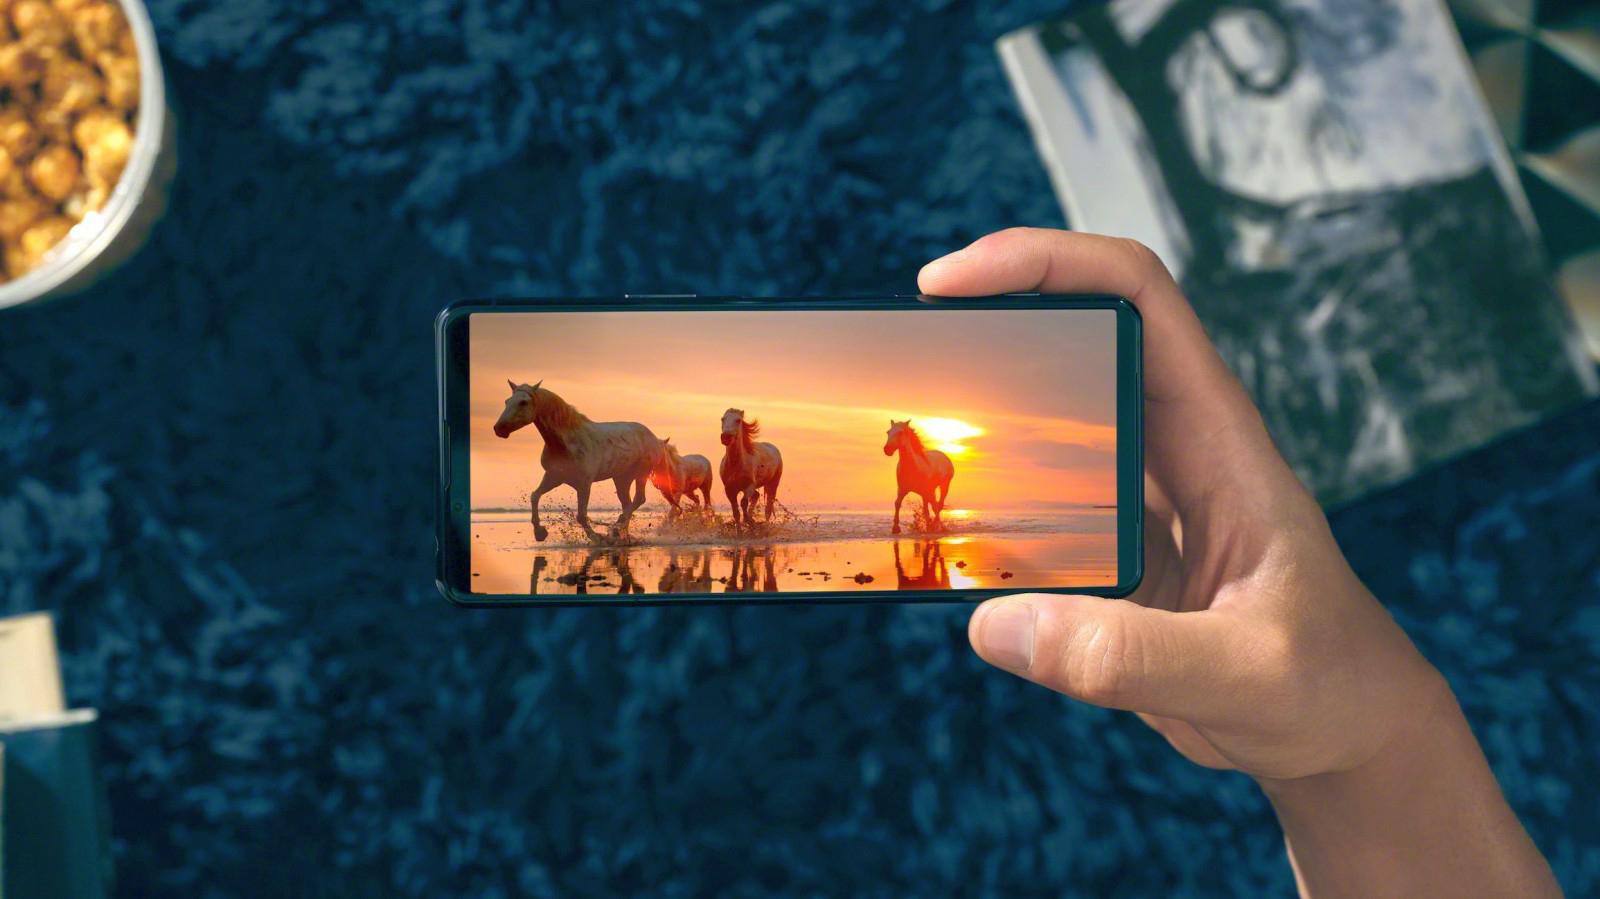 Sony Xperia 1ii จะได้รับอัพเดทให้ใช้งาน Full HD 120Hz และ Xperia 5ii พร้อมอัพเดท Android 11 หลังจำหน่าย